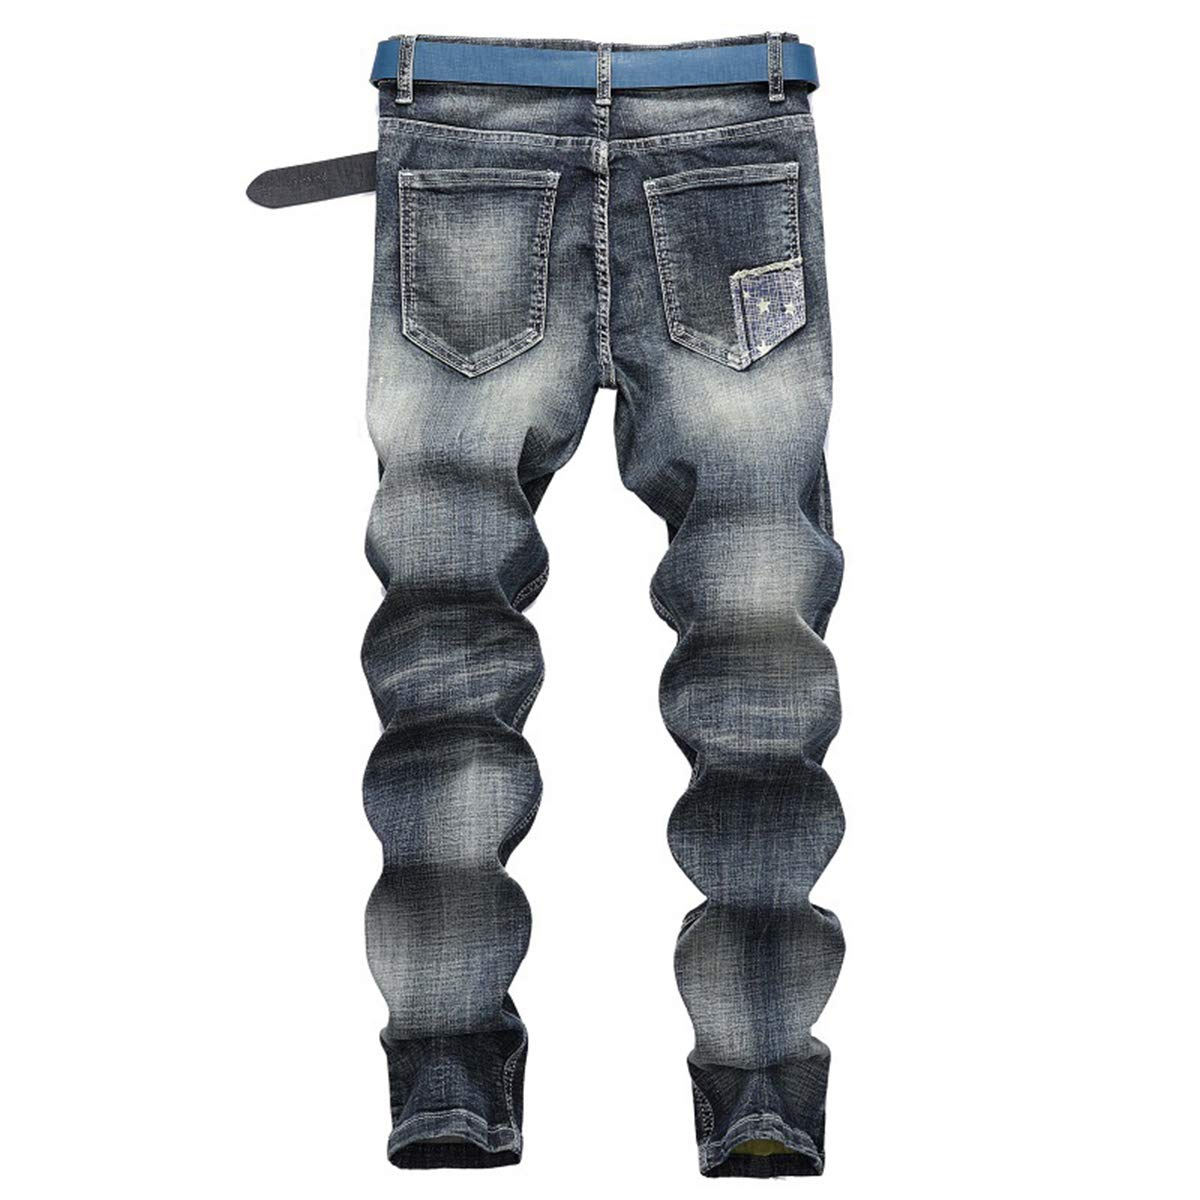 KORSE Mens Distressed Ripped Biker Slim Fit Jeans Moto Retro Denim Pants